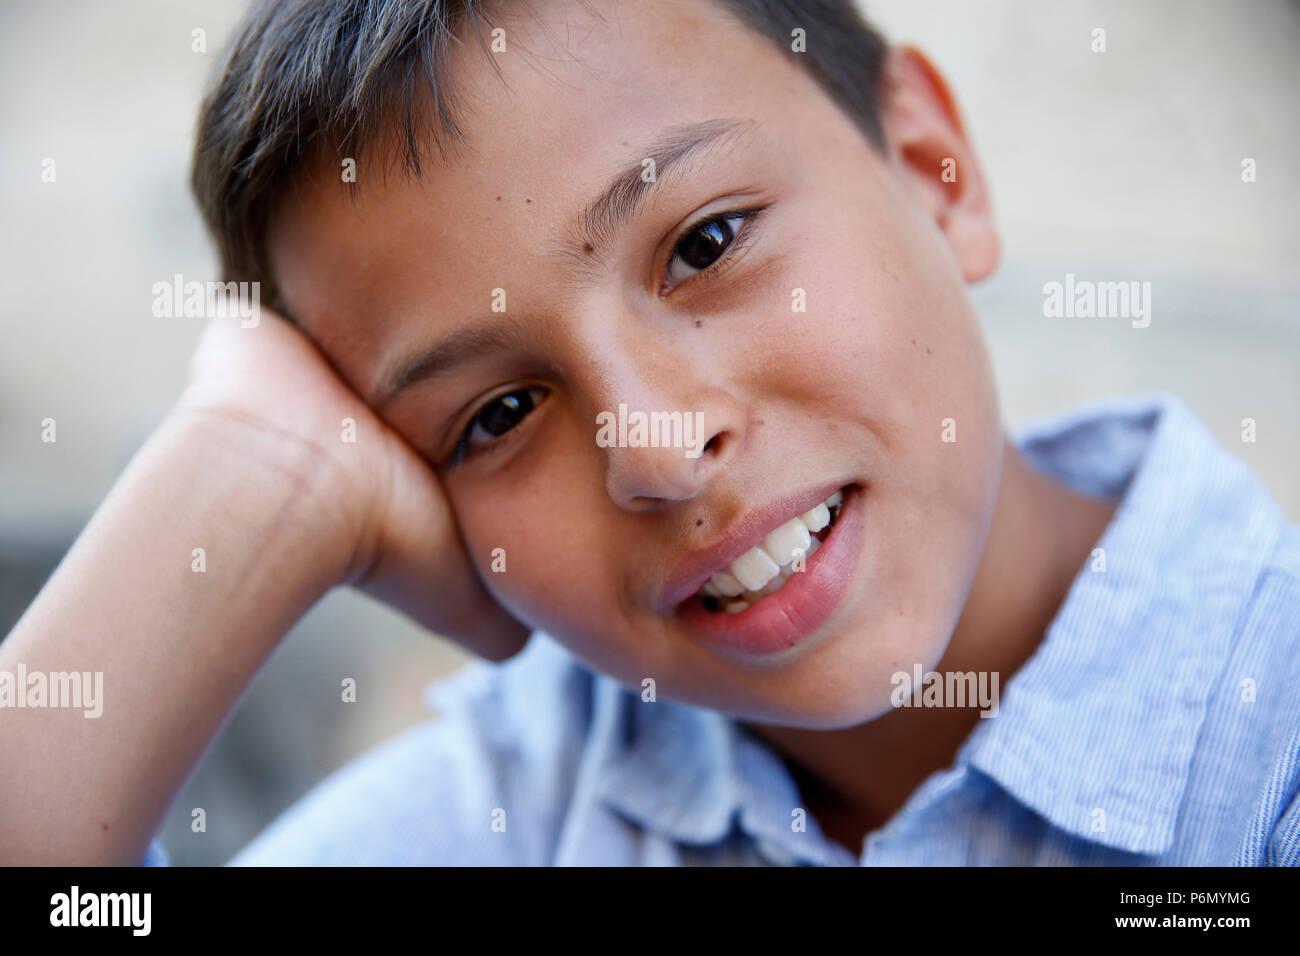 11-jähriger Junge im Salento, Italien. Stockbild